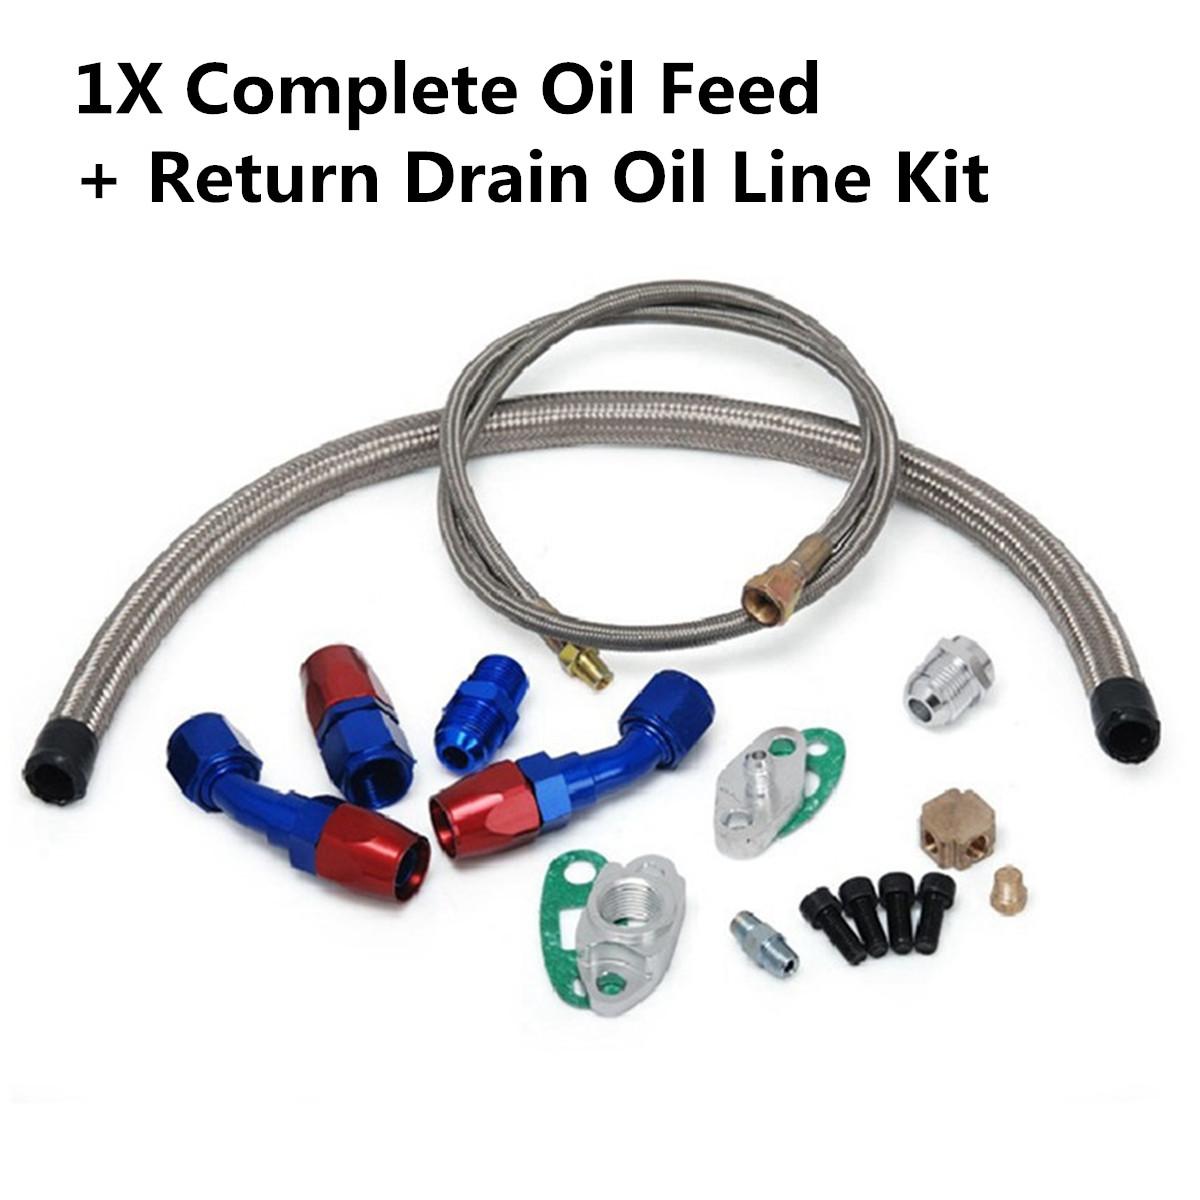 T3//T4 Turbo Oil Feed Line+Return Line+Drain Line Complete Kit T3 T4 T70 T66 TO4E